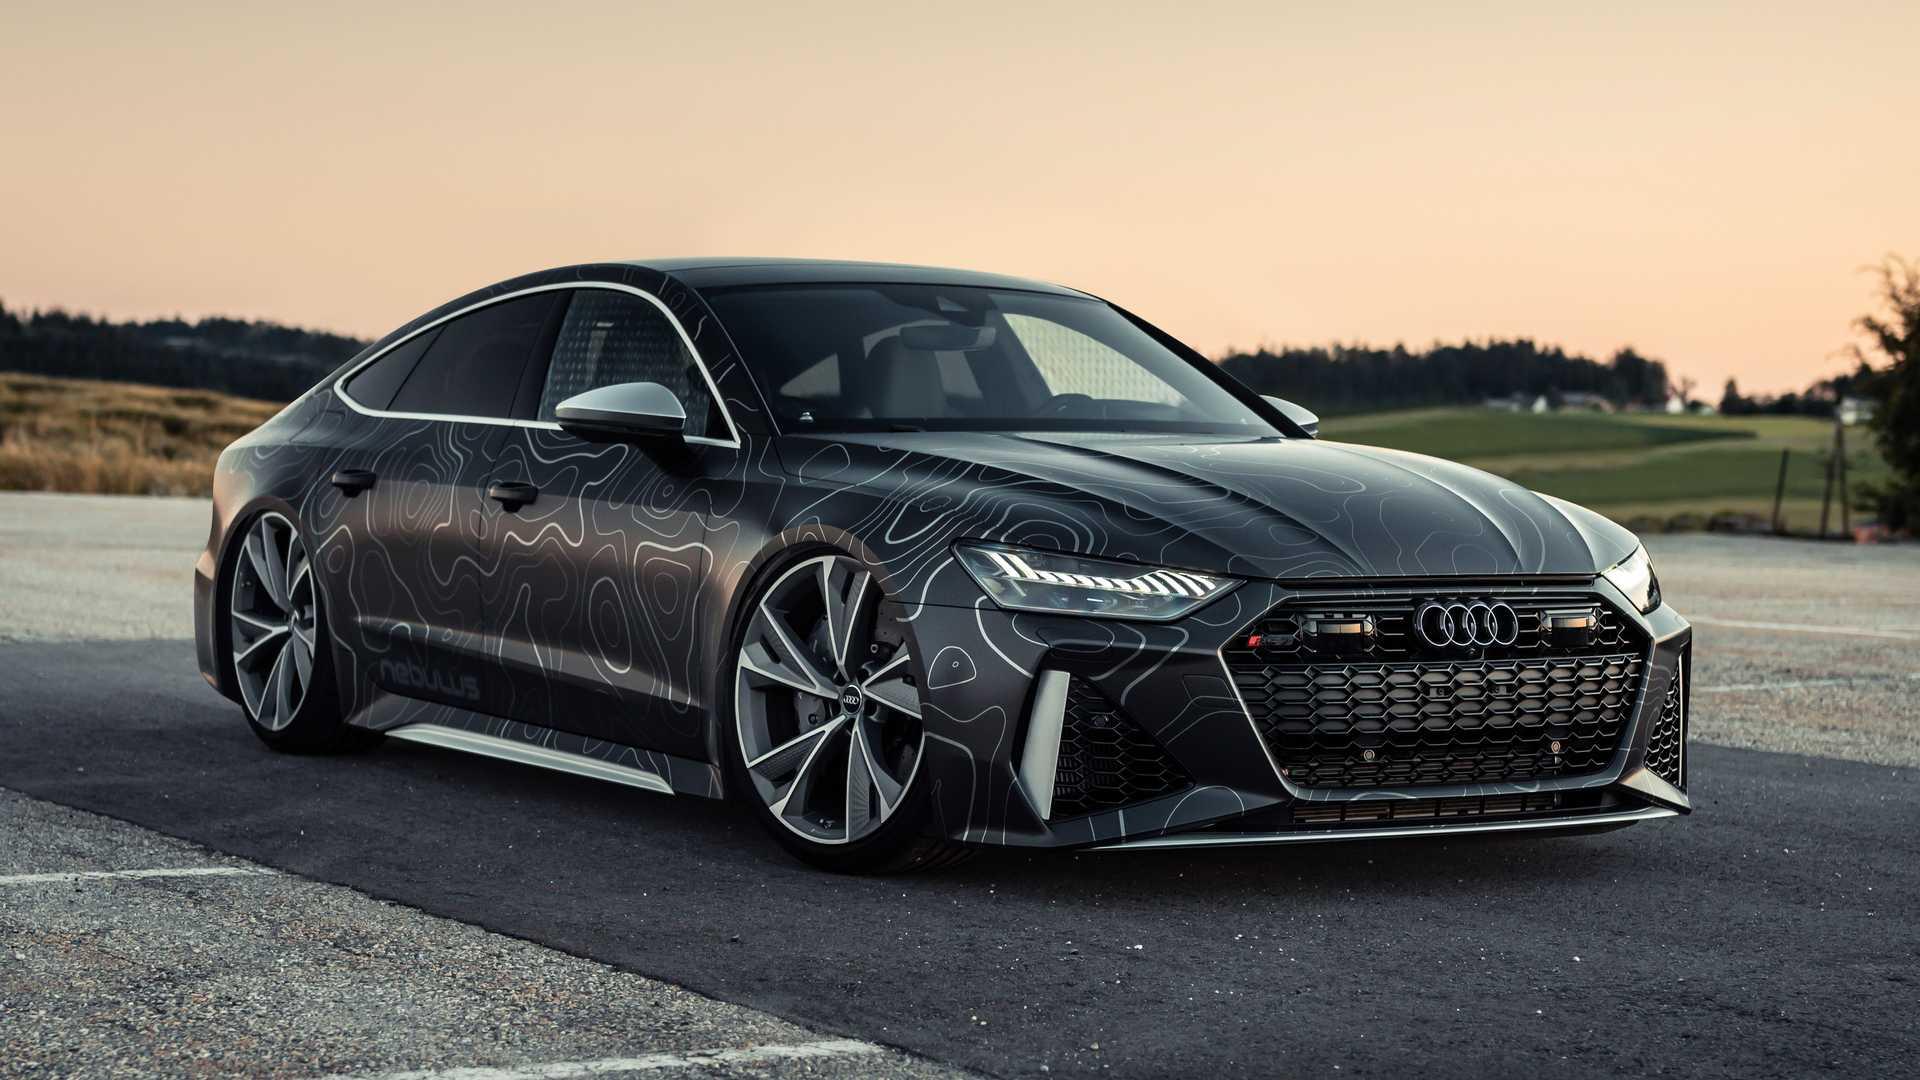 Audi-RS7-By-Black-Box-Richter-1